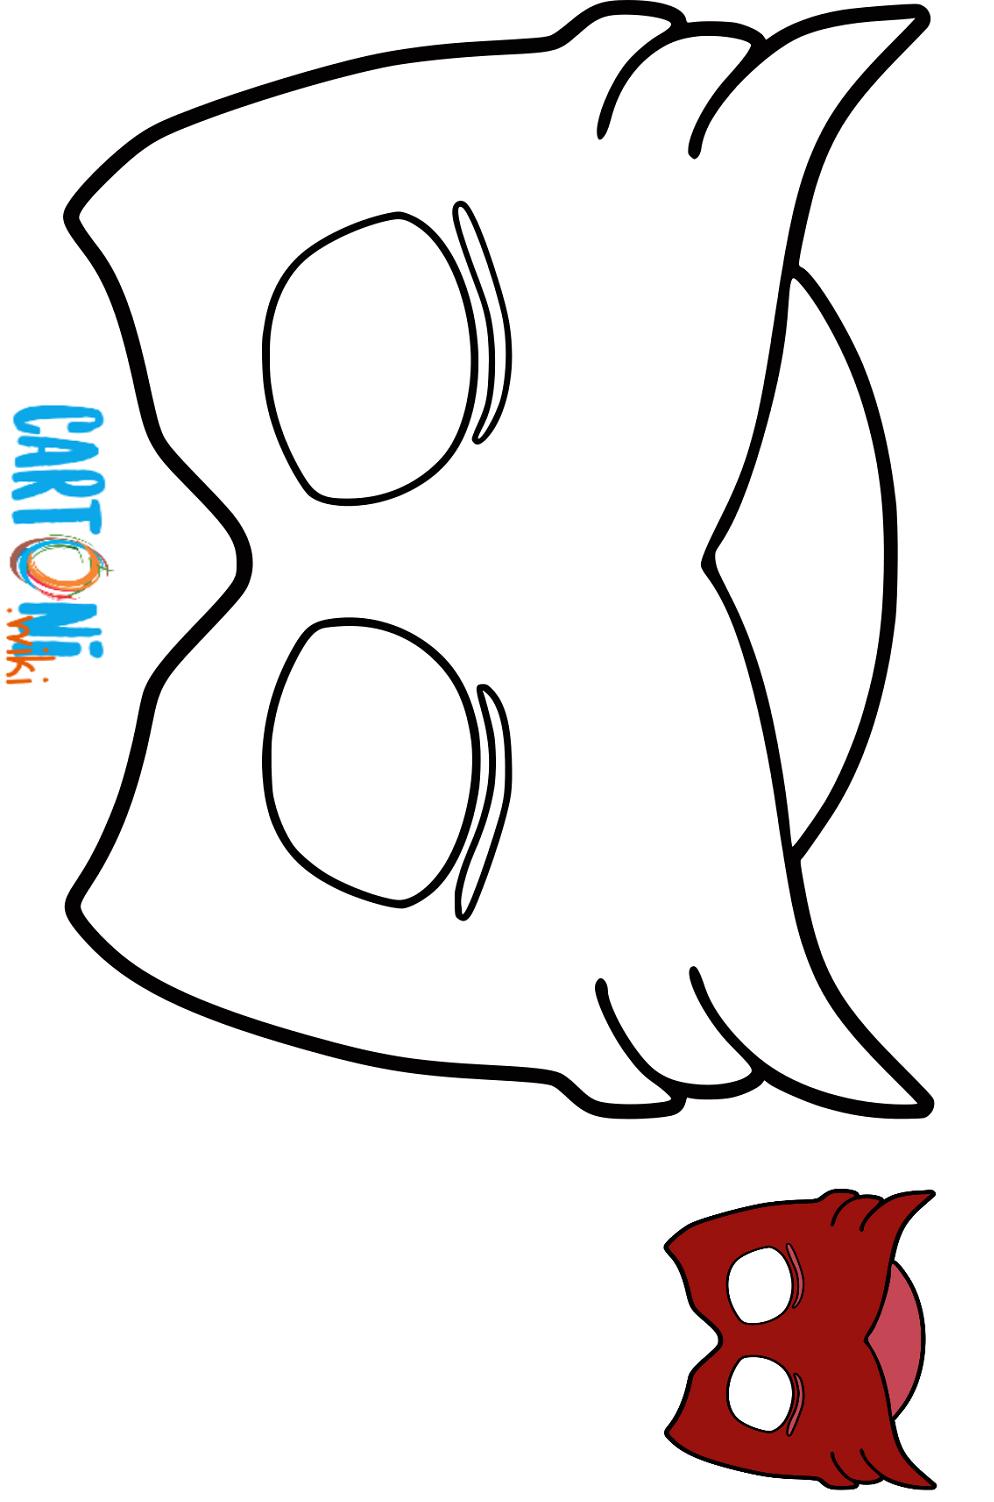 Maschera Gufetta da colorare - Disegni da colorare, Maschere